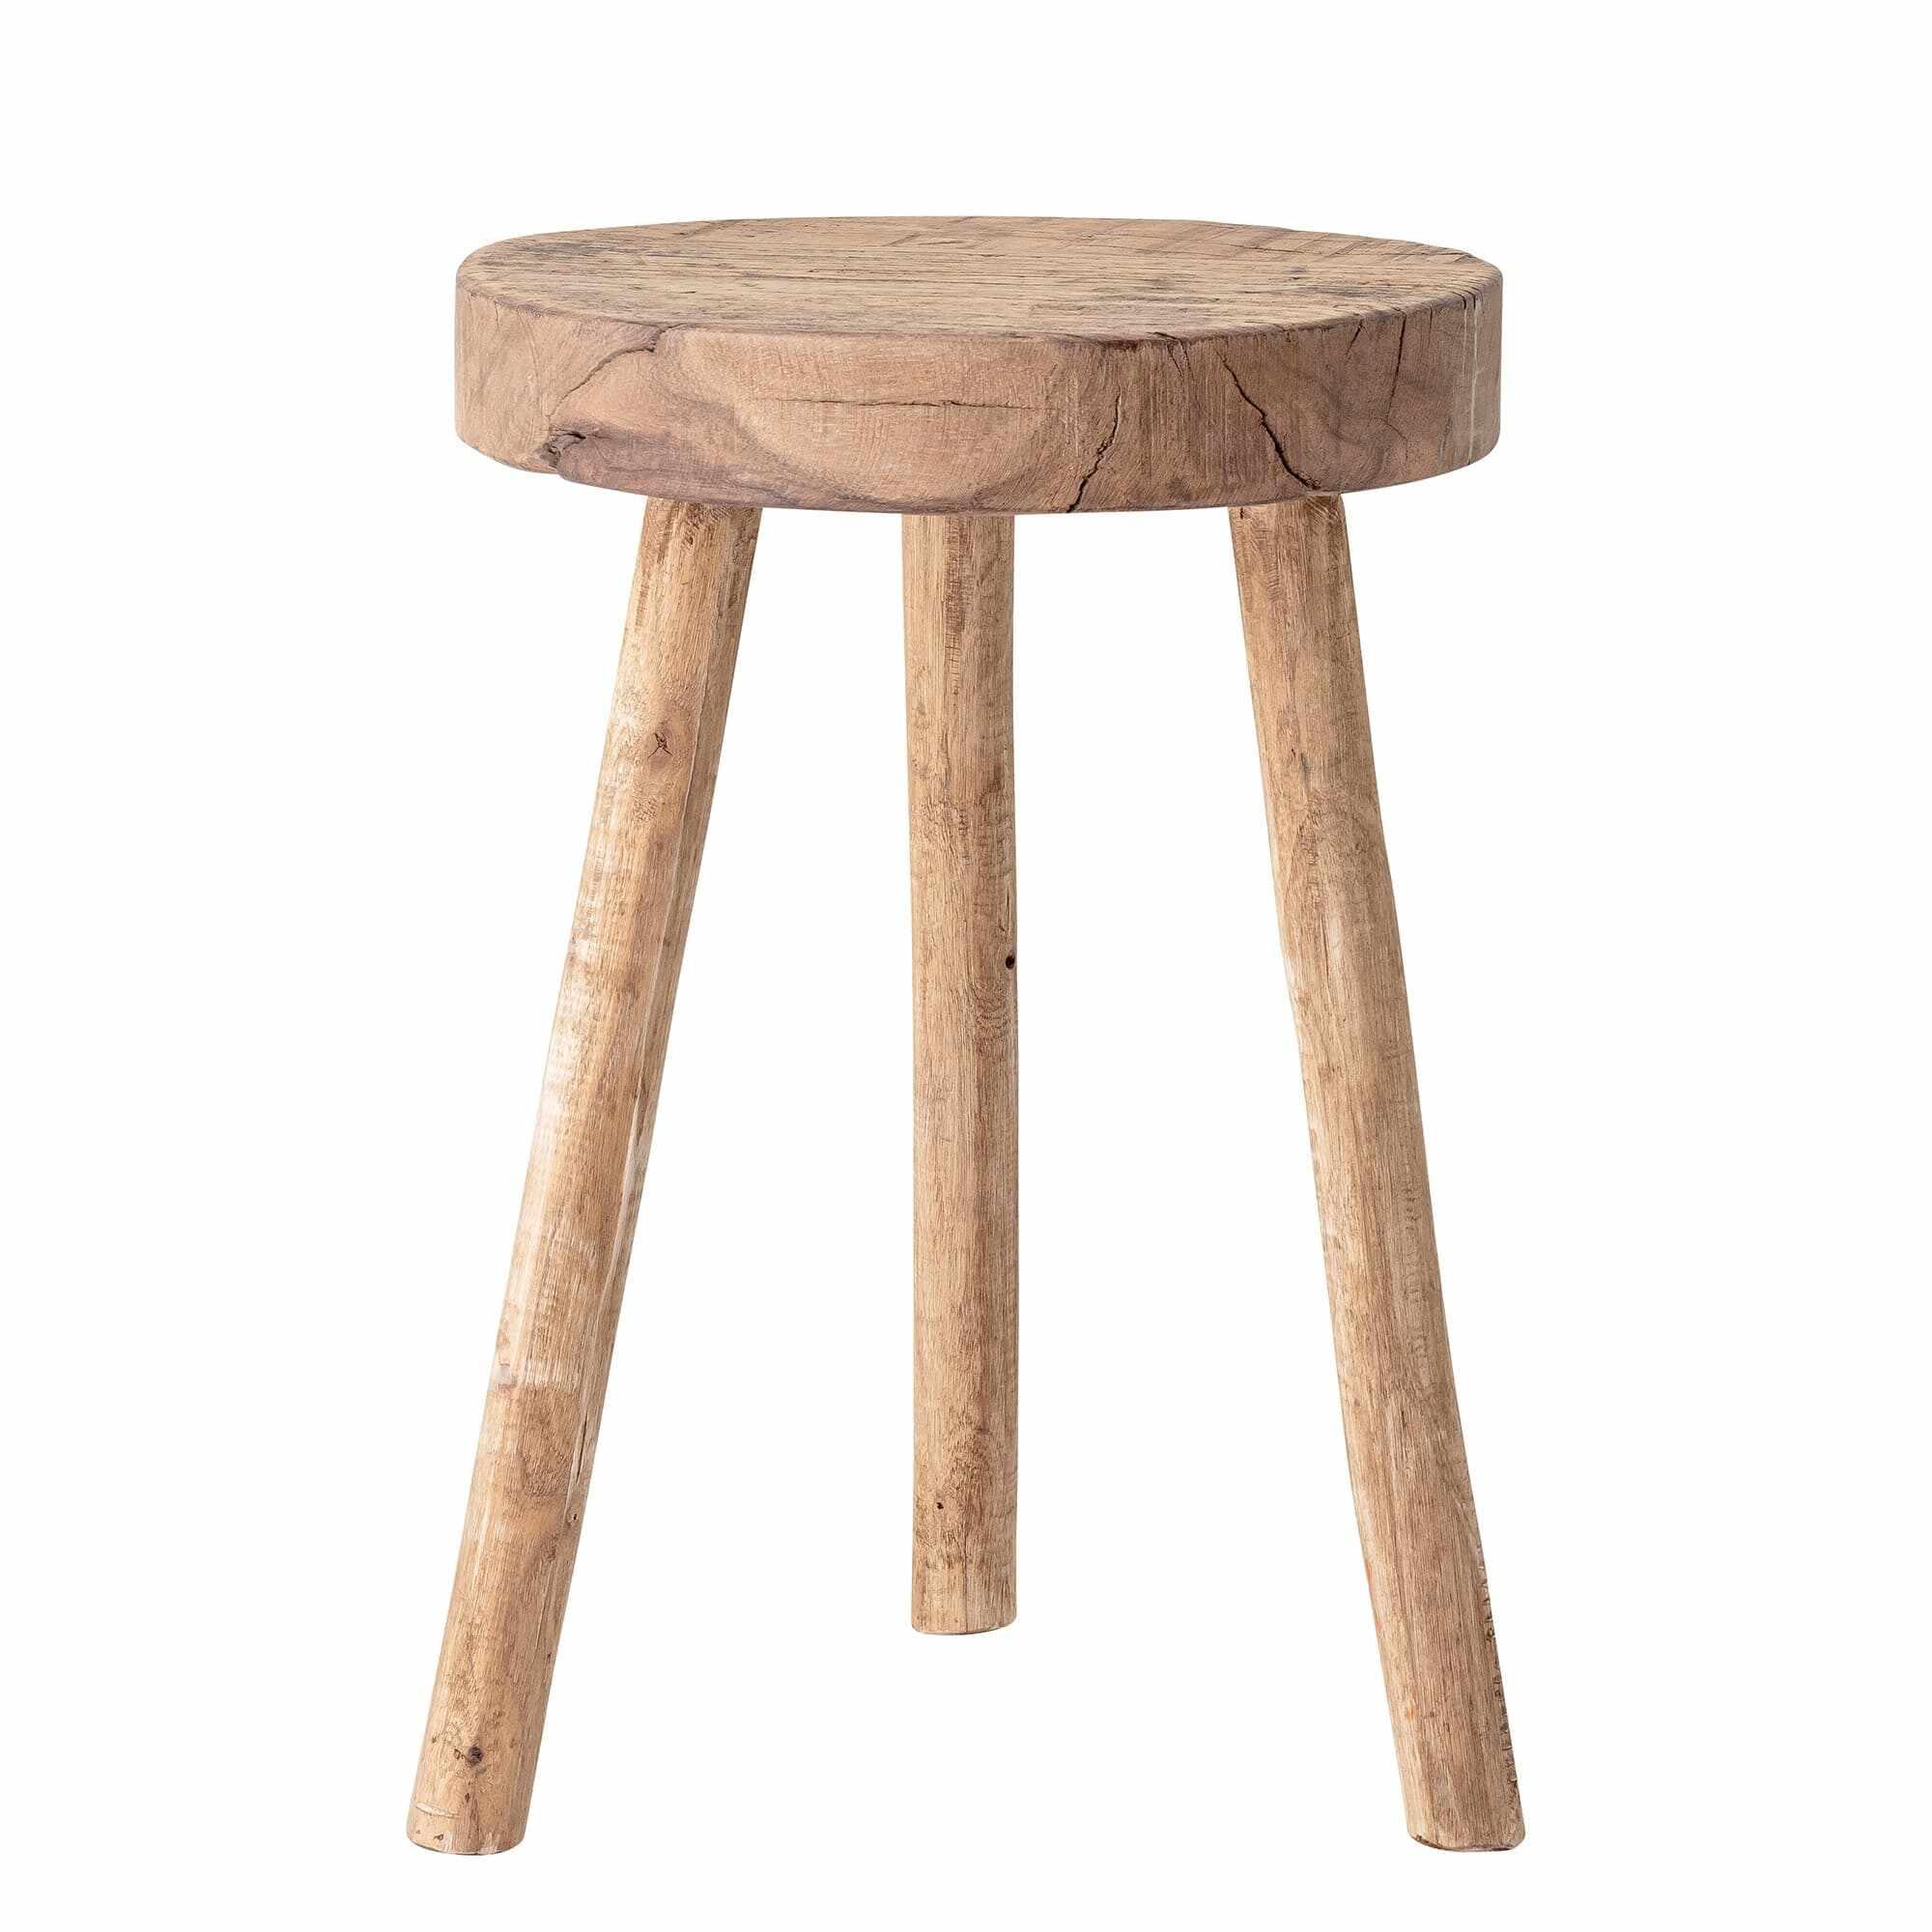 Scaun din lemn Banu Natur, Ø33xH45 cm la pret 568 lei